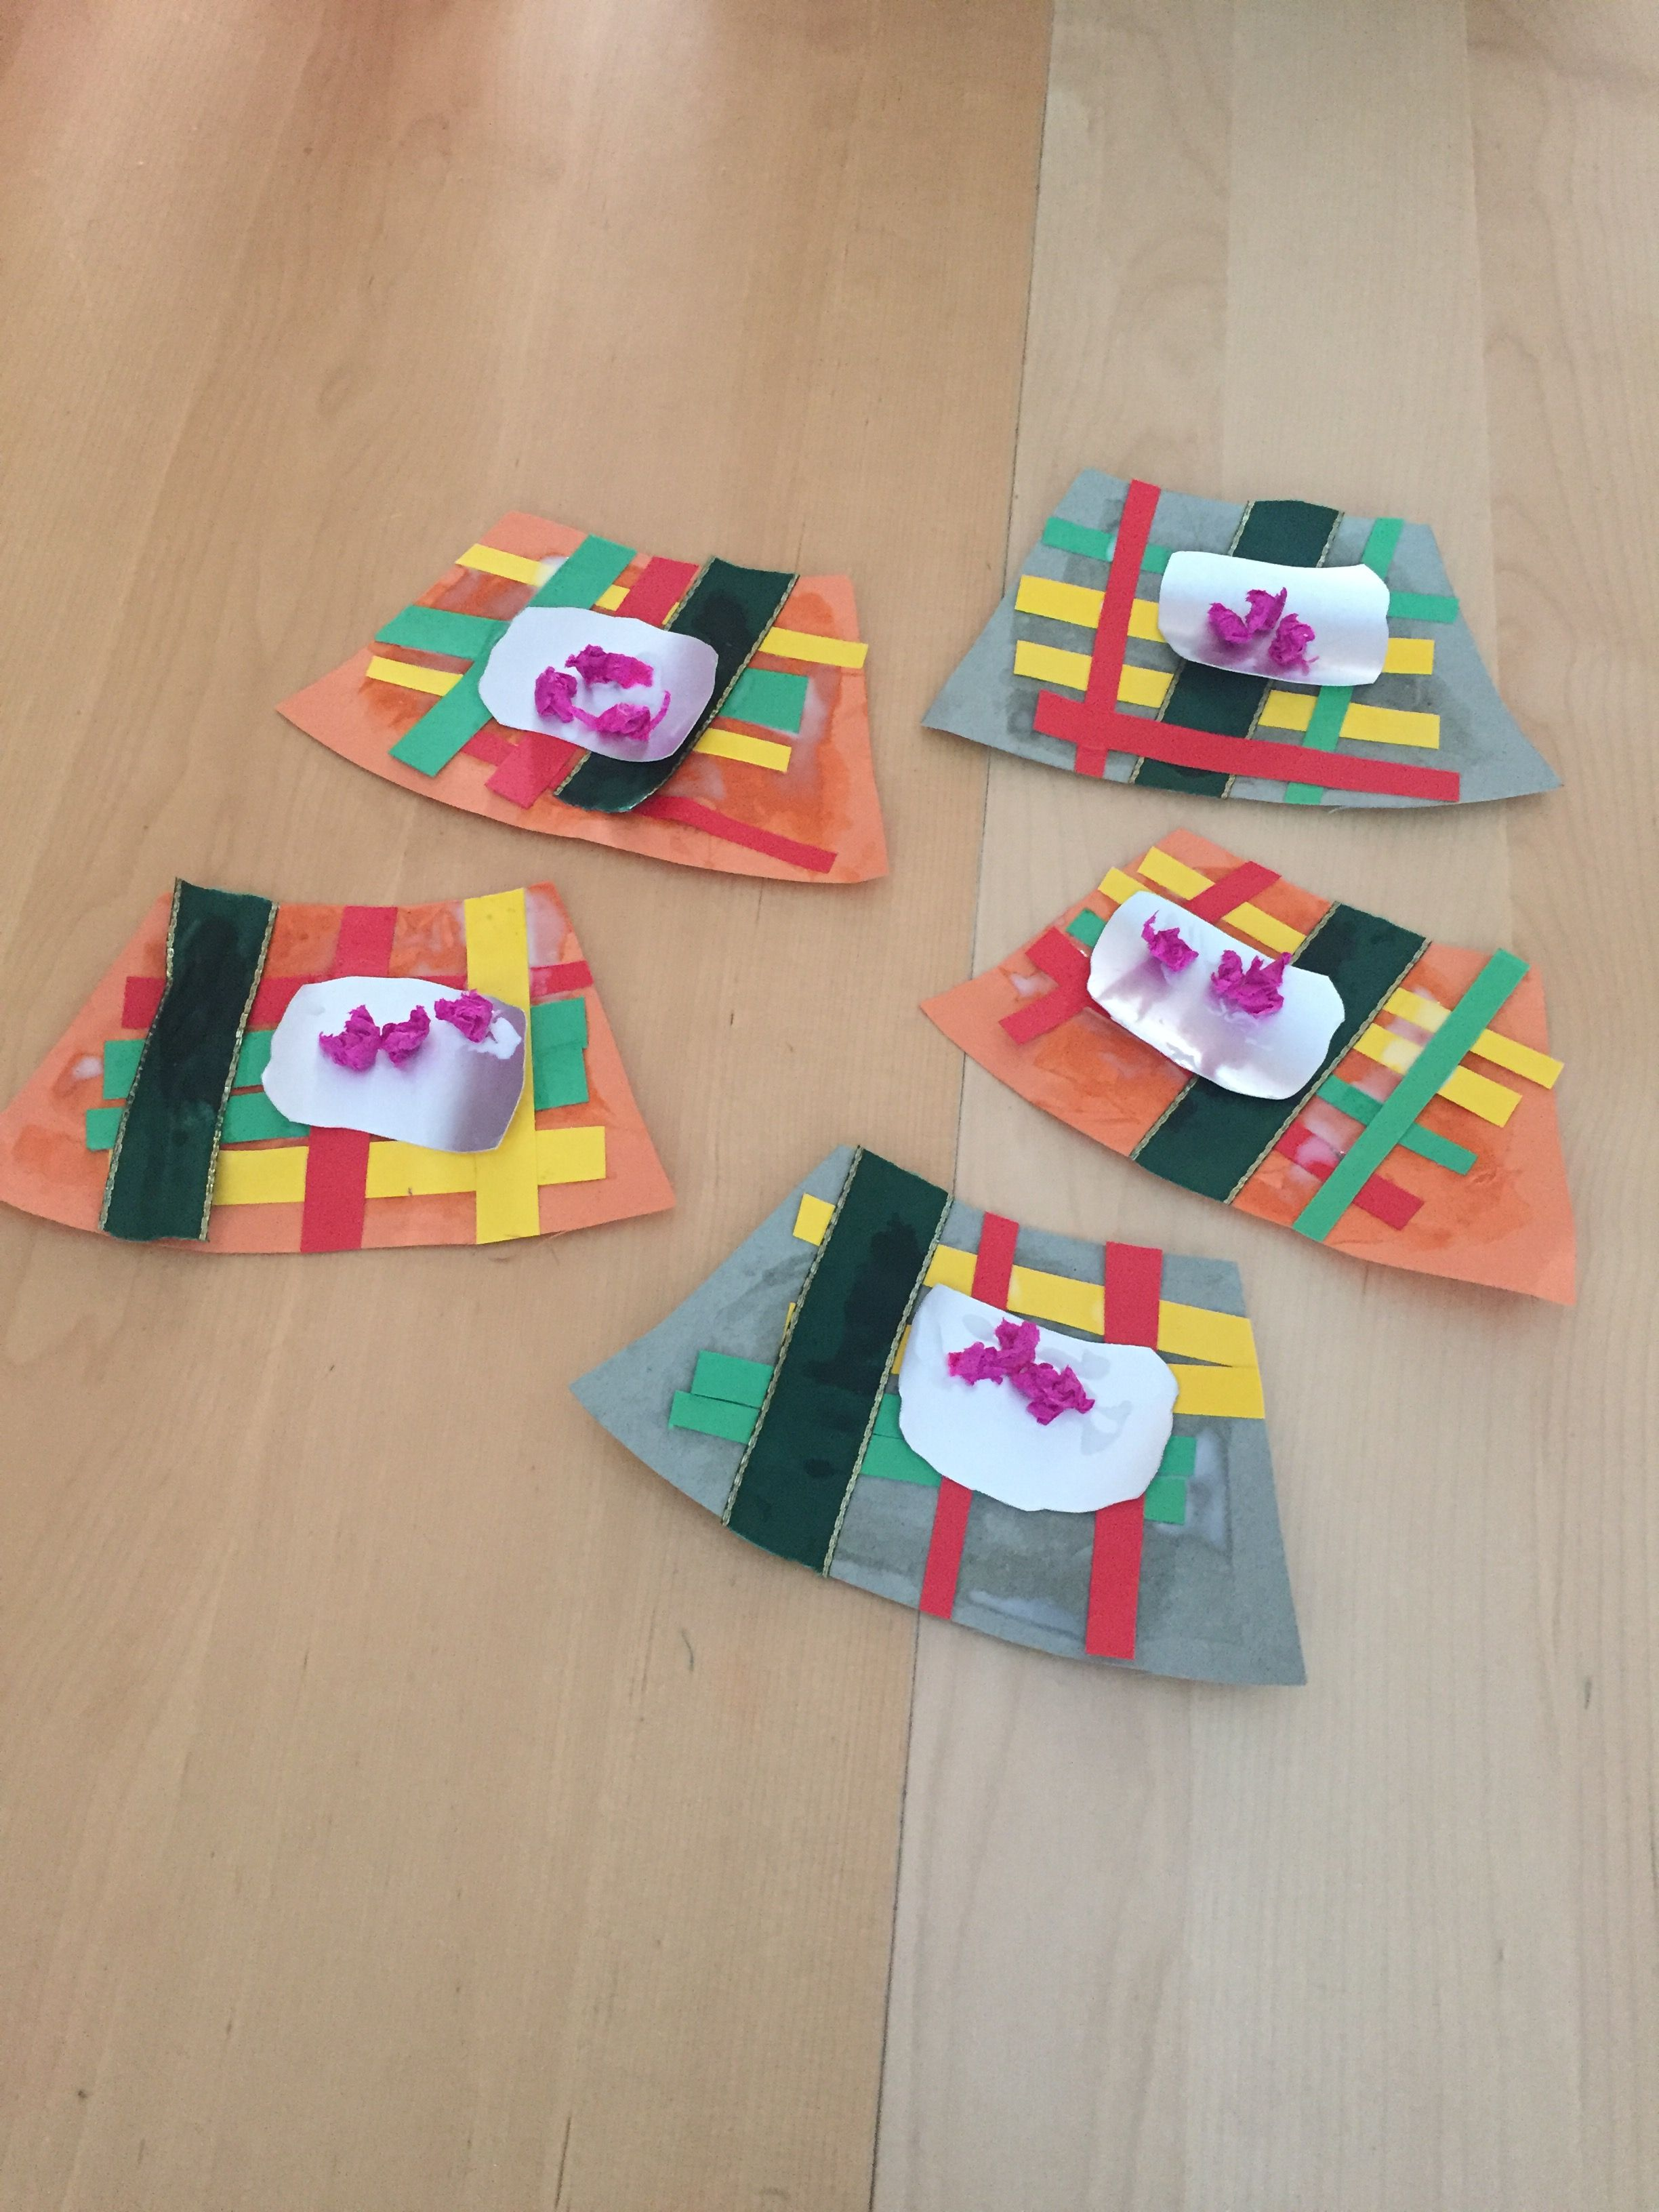 Kilts For Burns Night 25th Jan Scottish Scotland Crafts Preschool Sticking Burnsnight